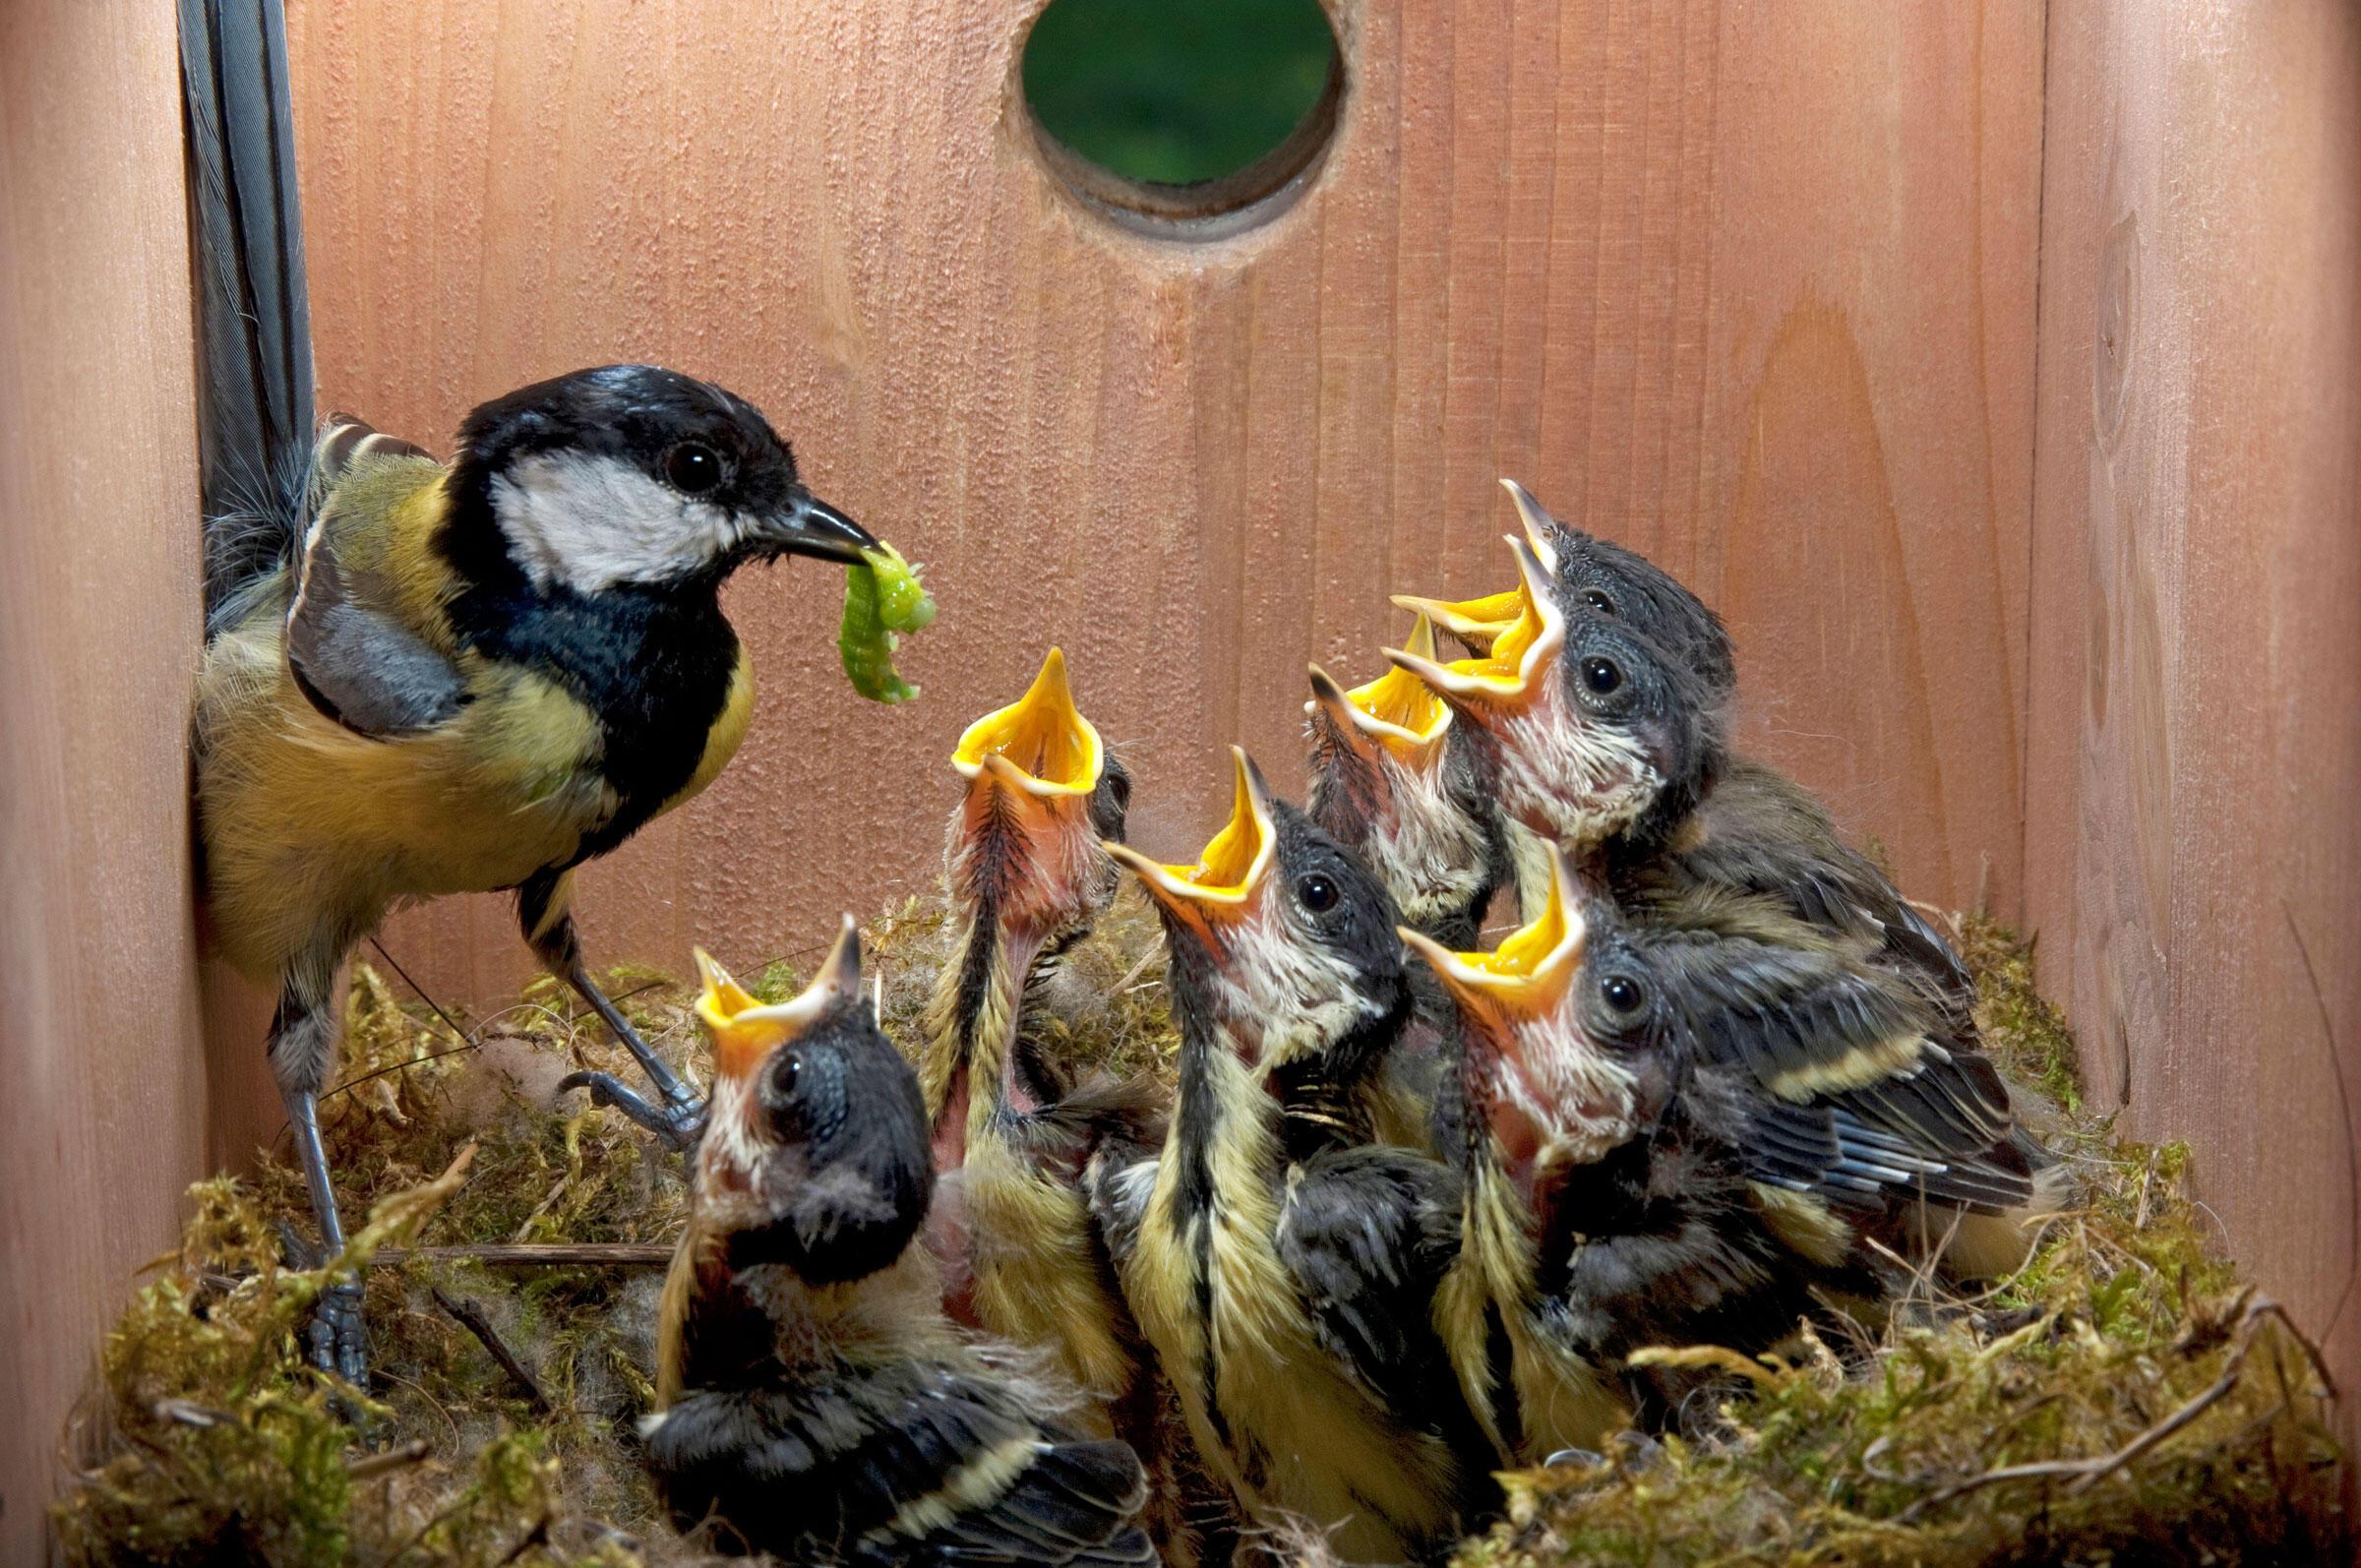 A Great Tit family, in a nest box. Juniors Bildarchiv GmbH/Alamy